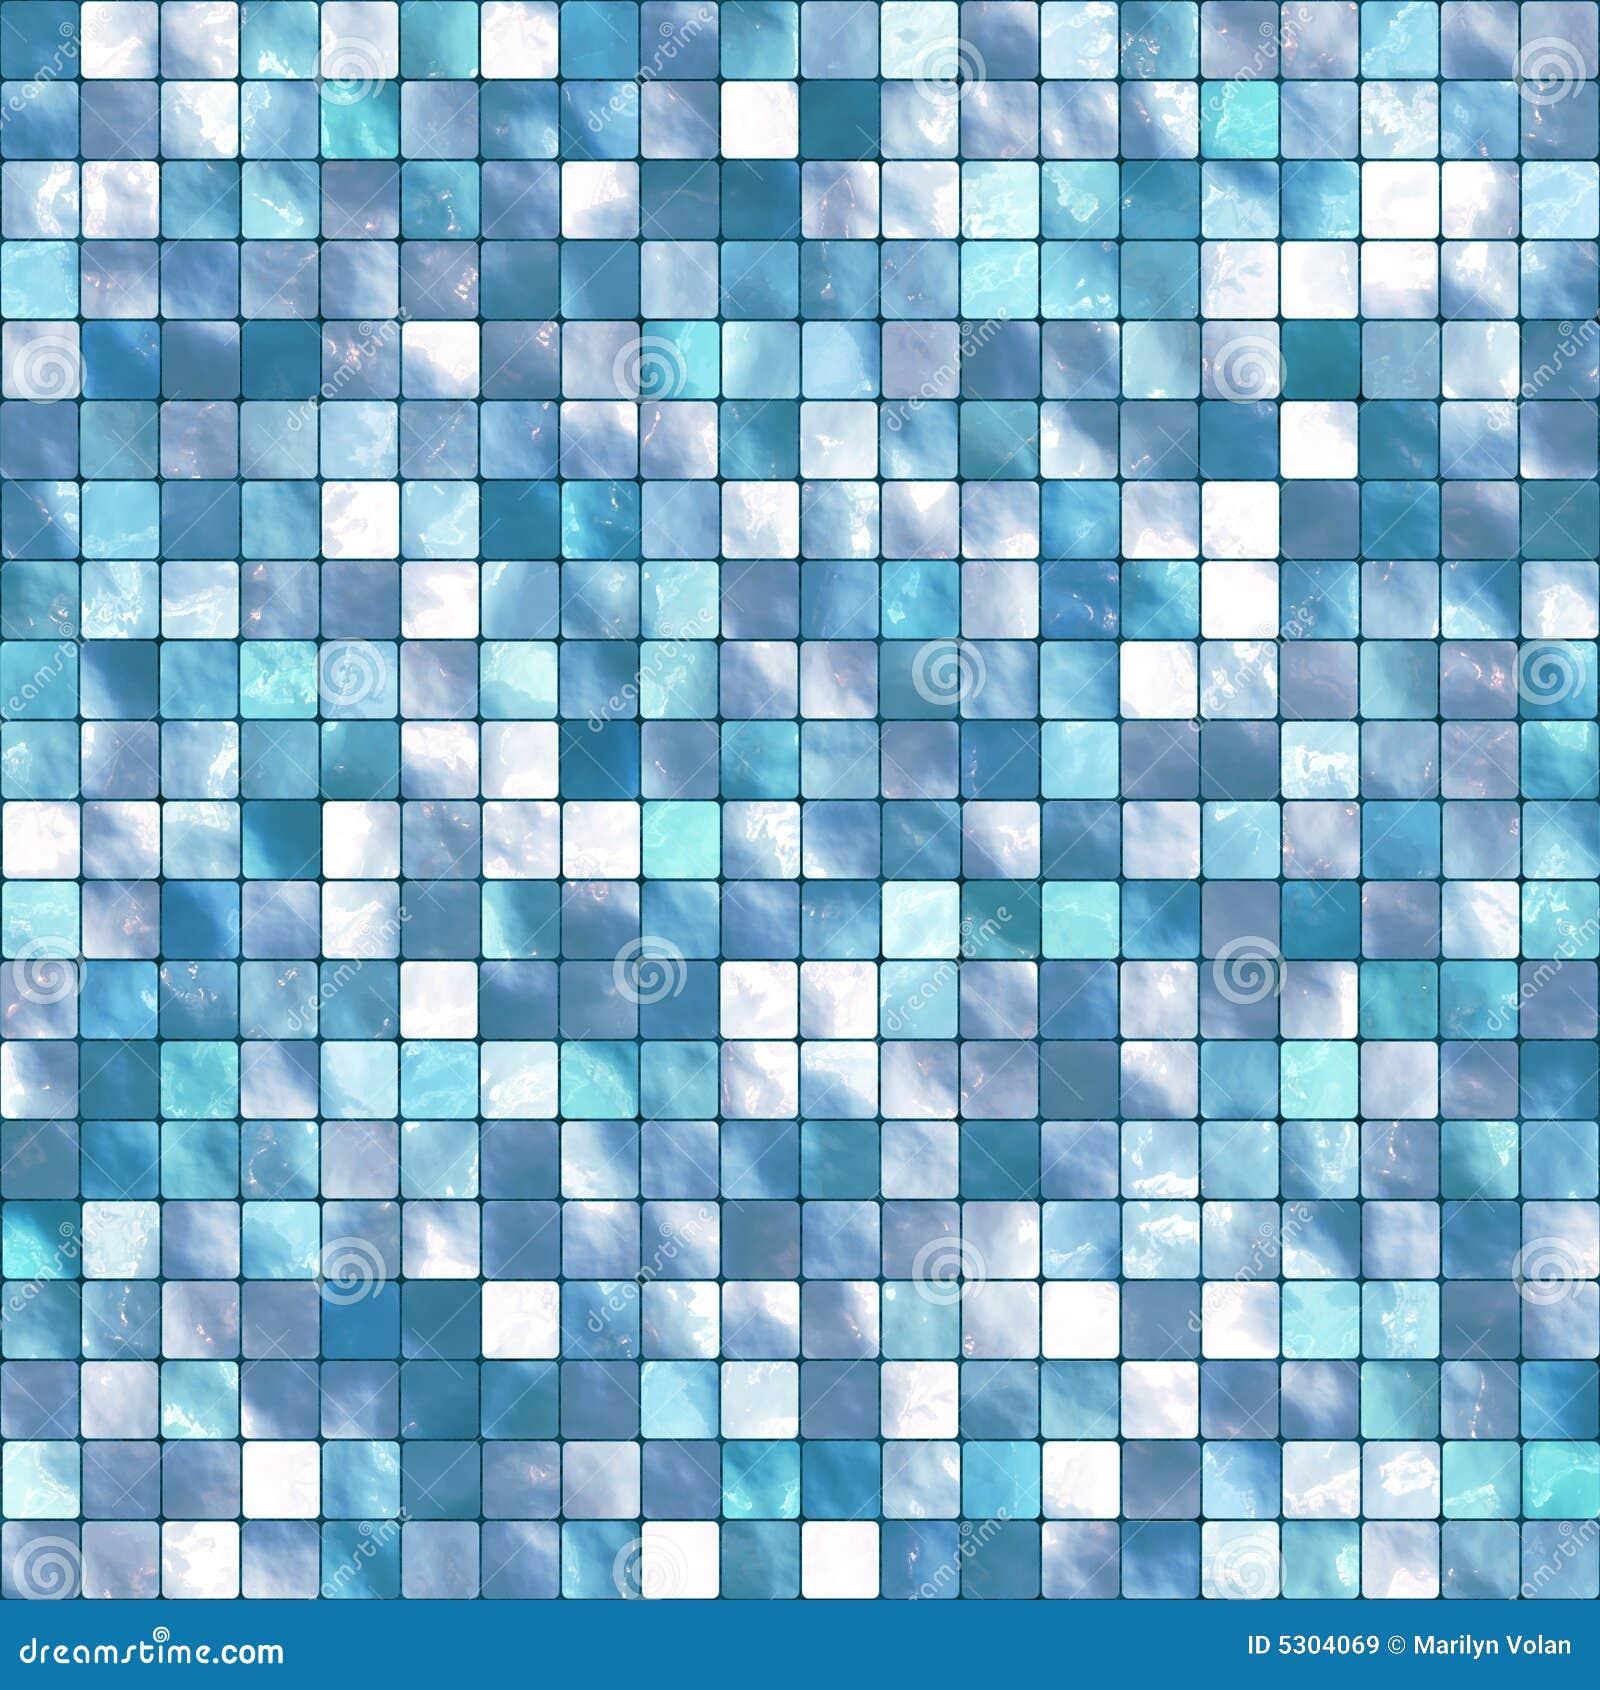 Unique Bathroom Ornamental Tiles Pattern Vector  Free Download